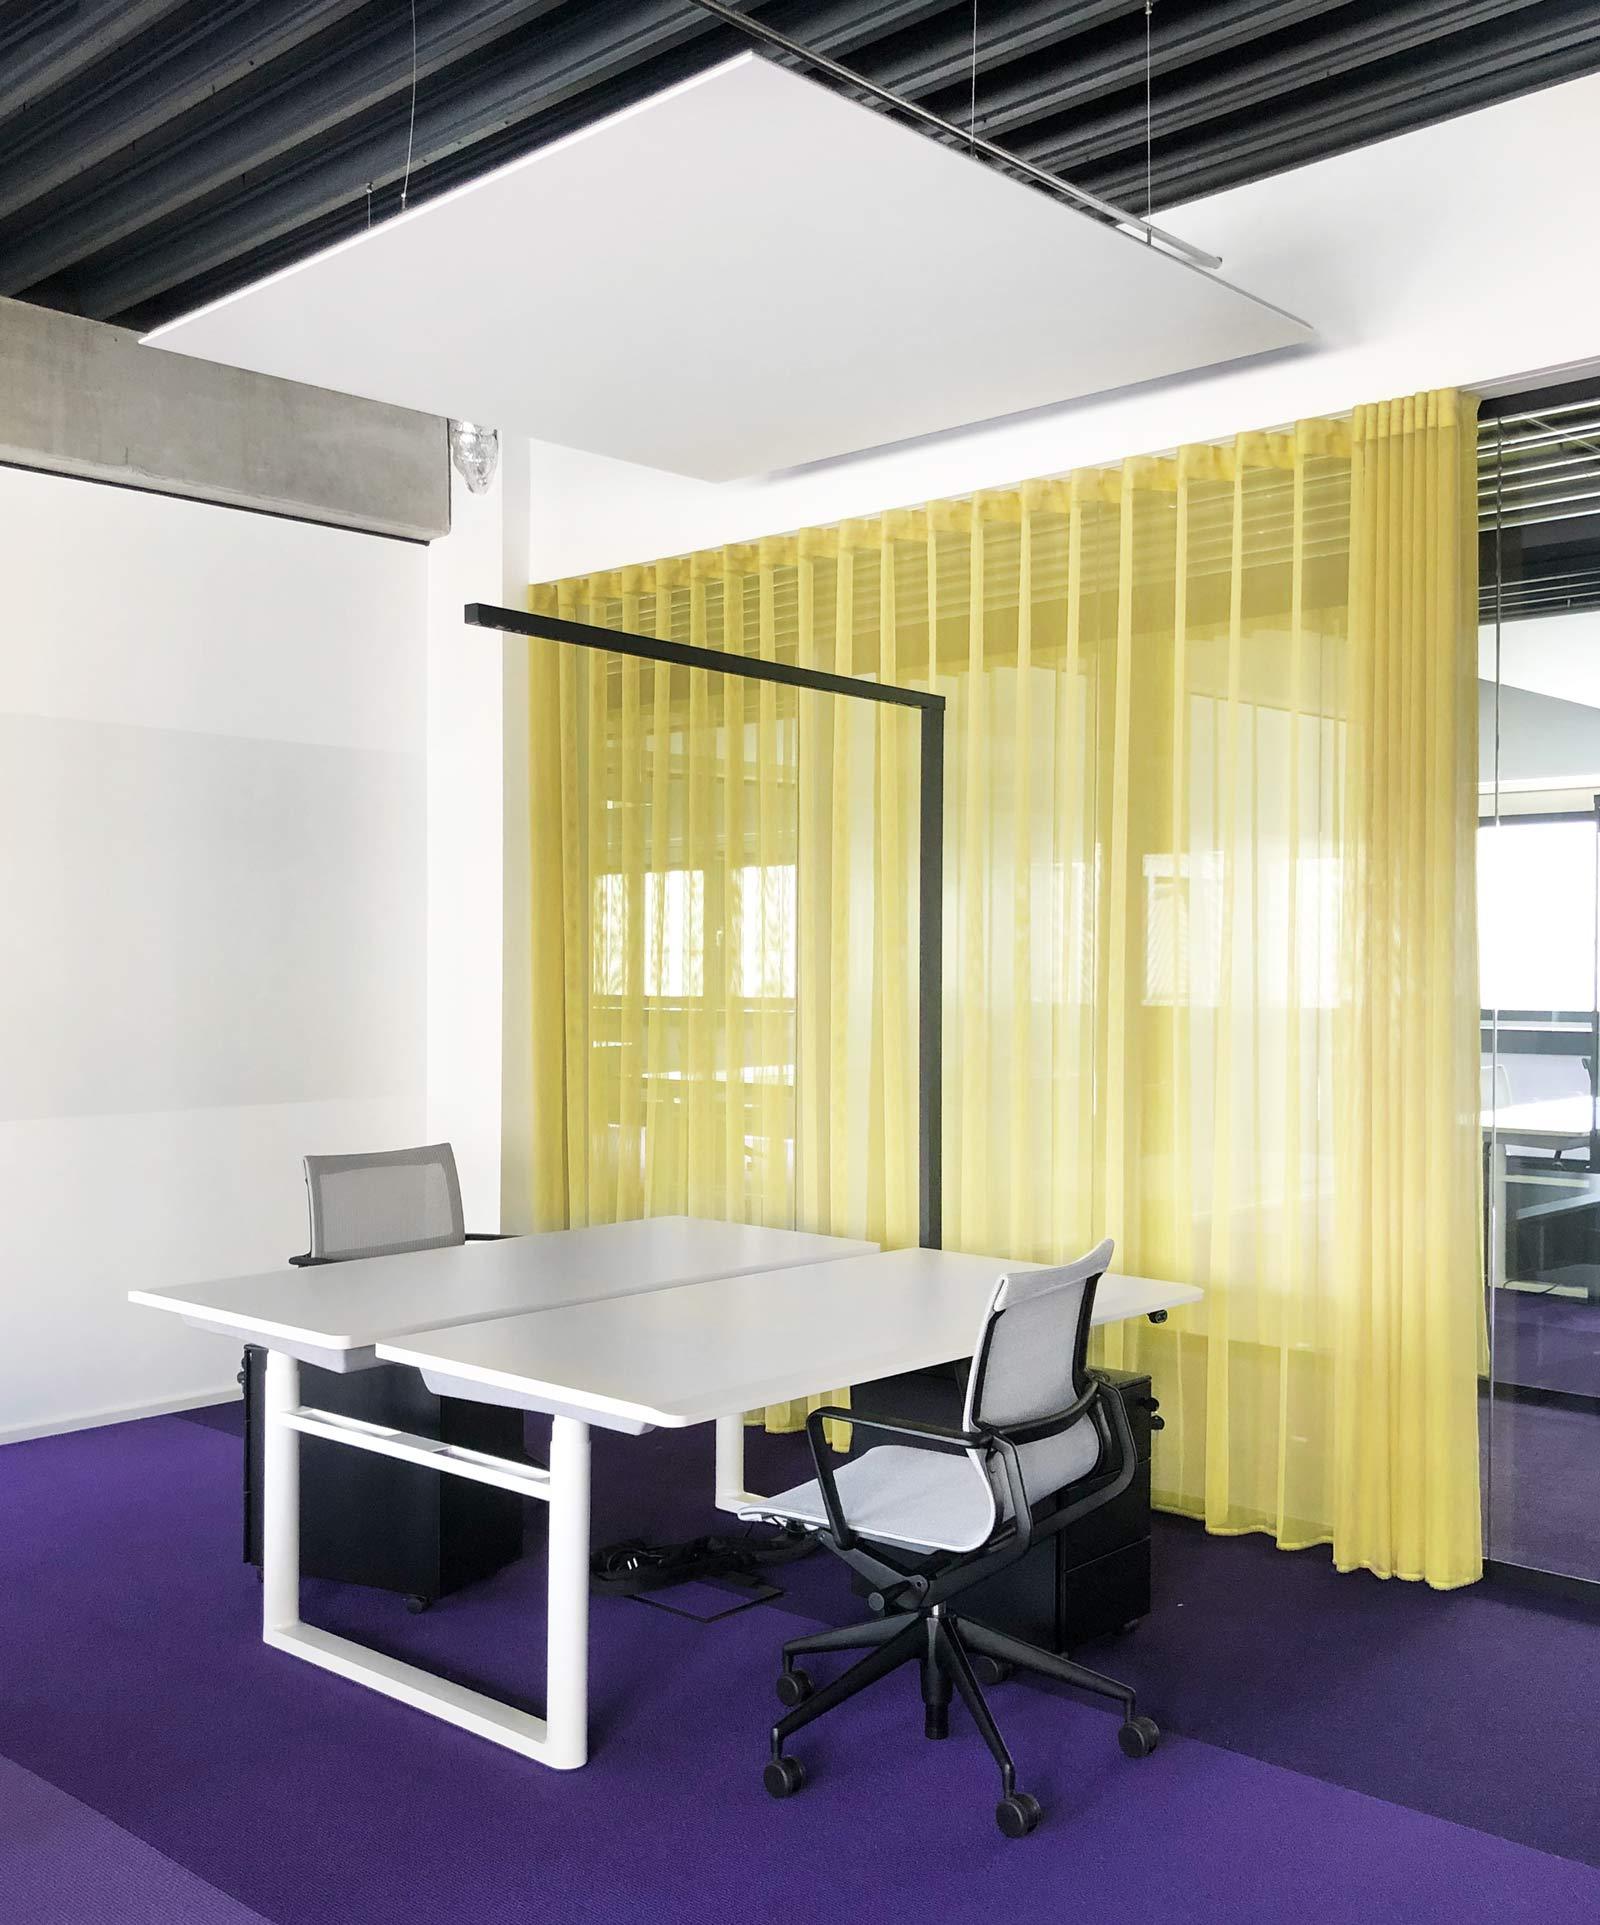 Komplementerfarbe, Office Design, Brand Space, Vitra, Kvadrat, Punct Object